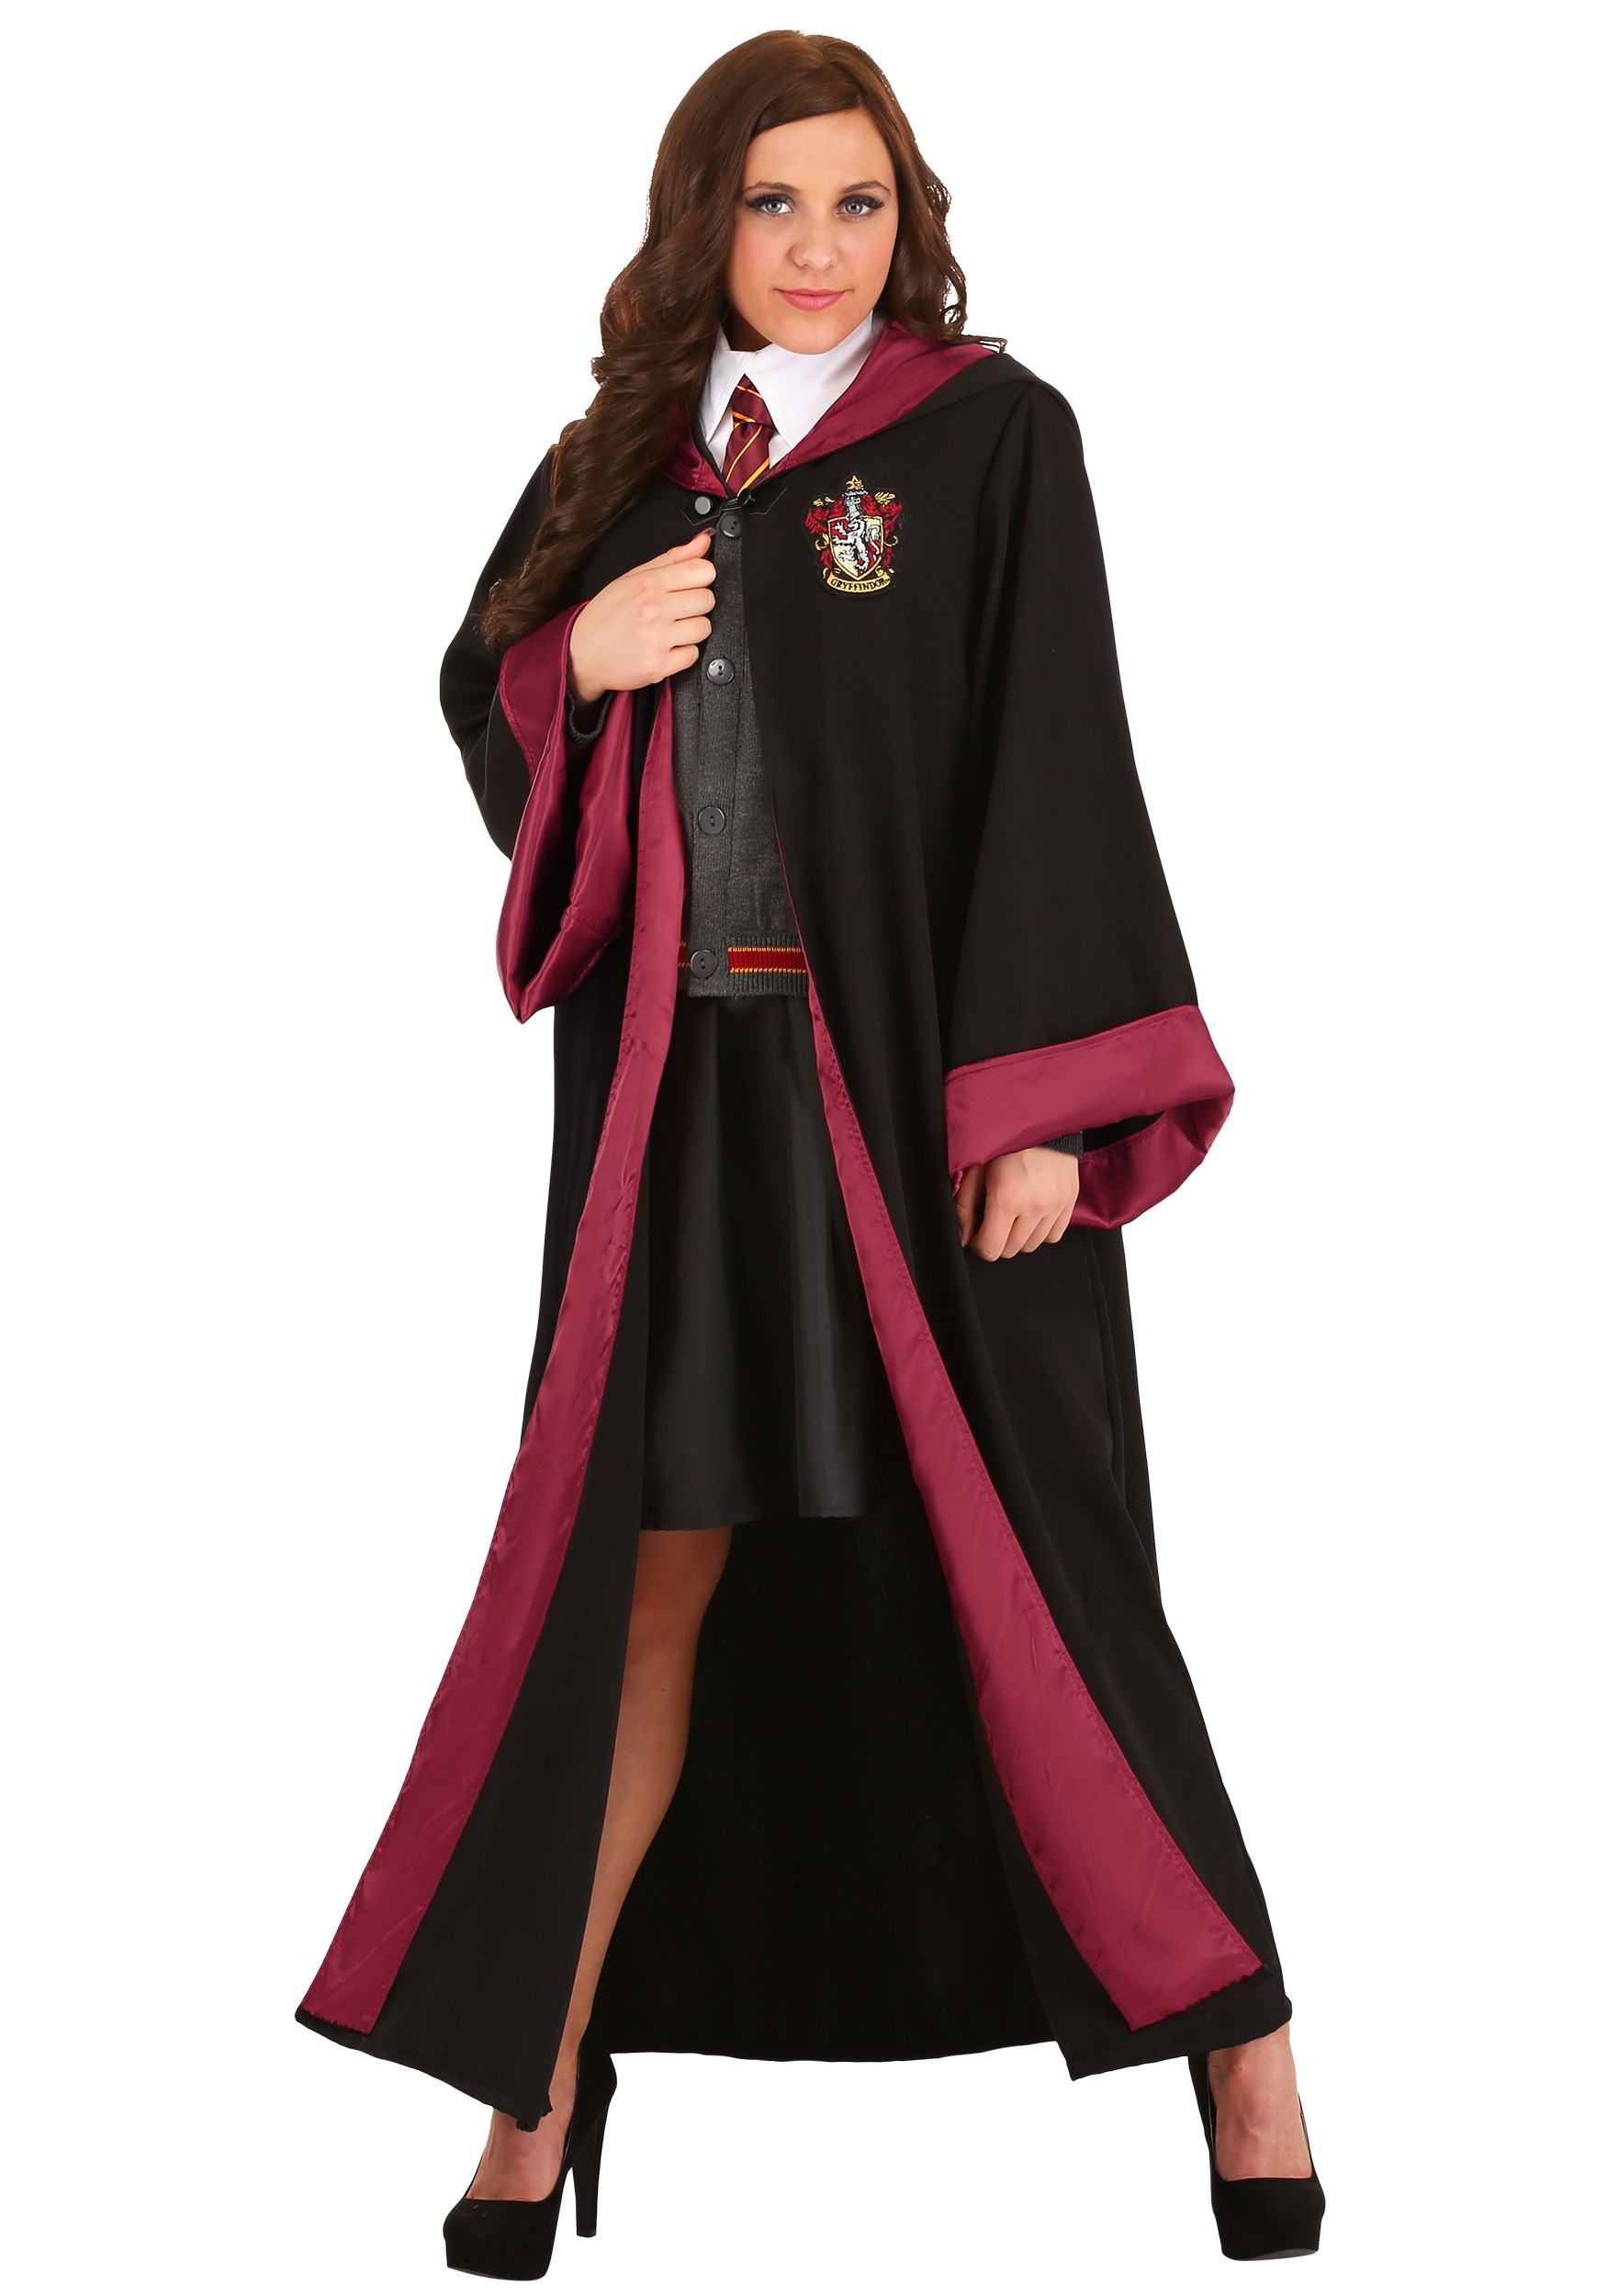 Plus Size Women's Deluxe Harry Potter Hermione Costume